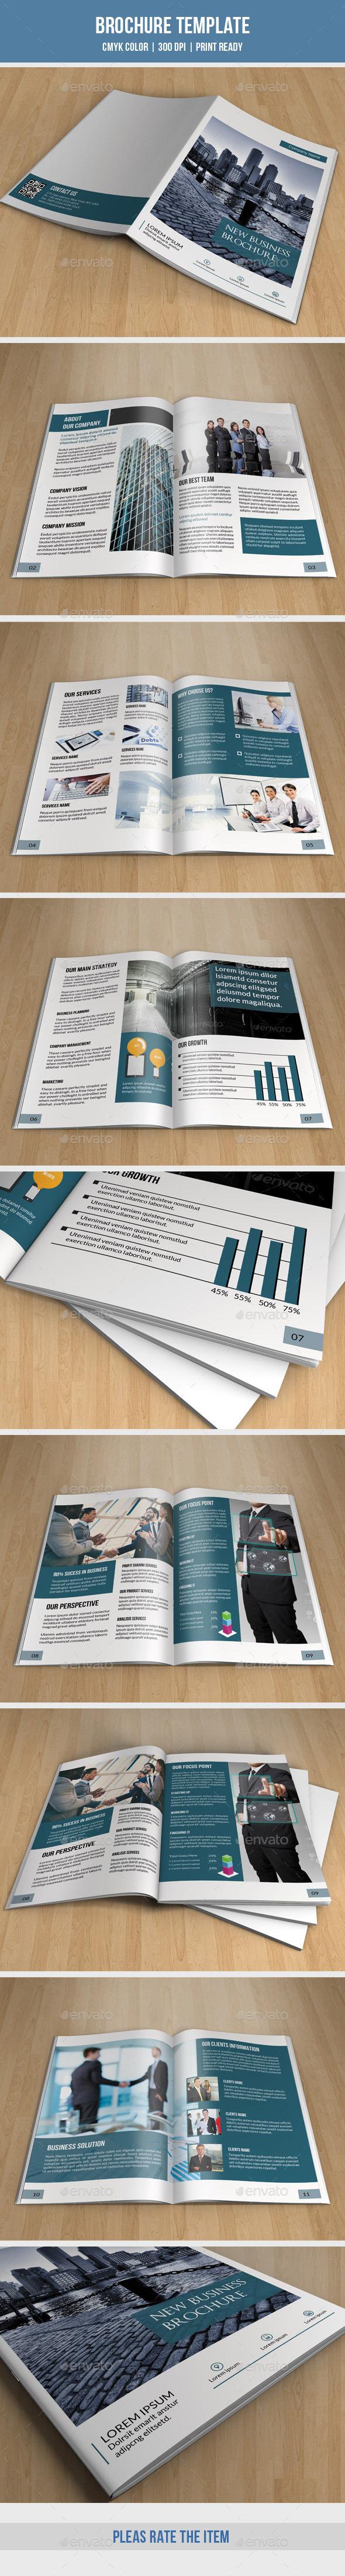 Corporate Brochure-V188 - Corporate Brochures